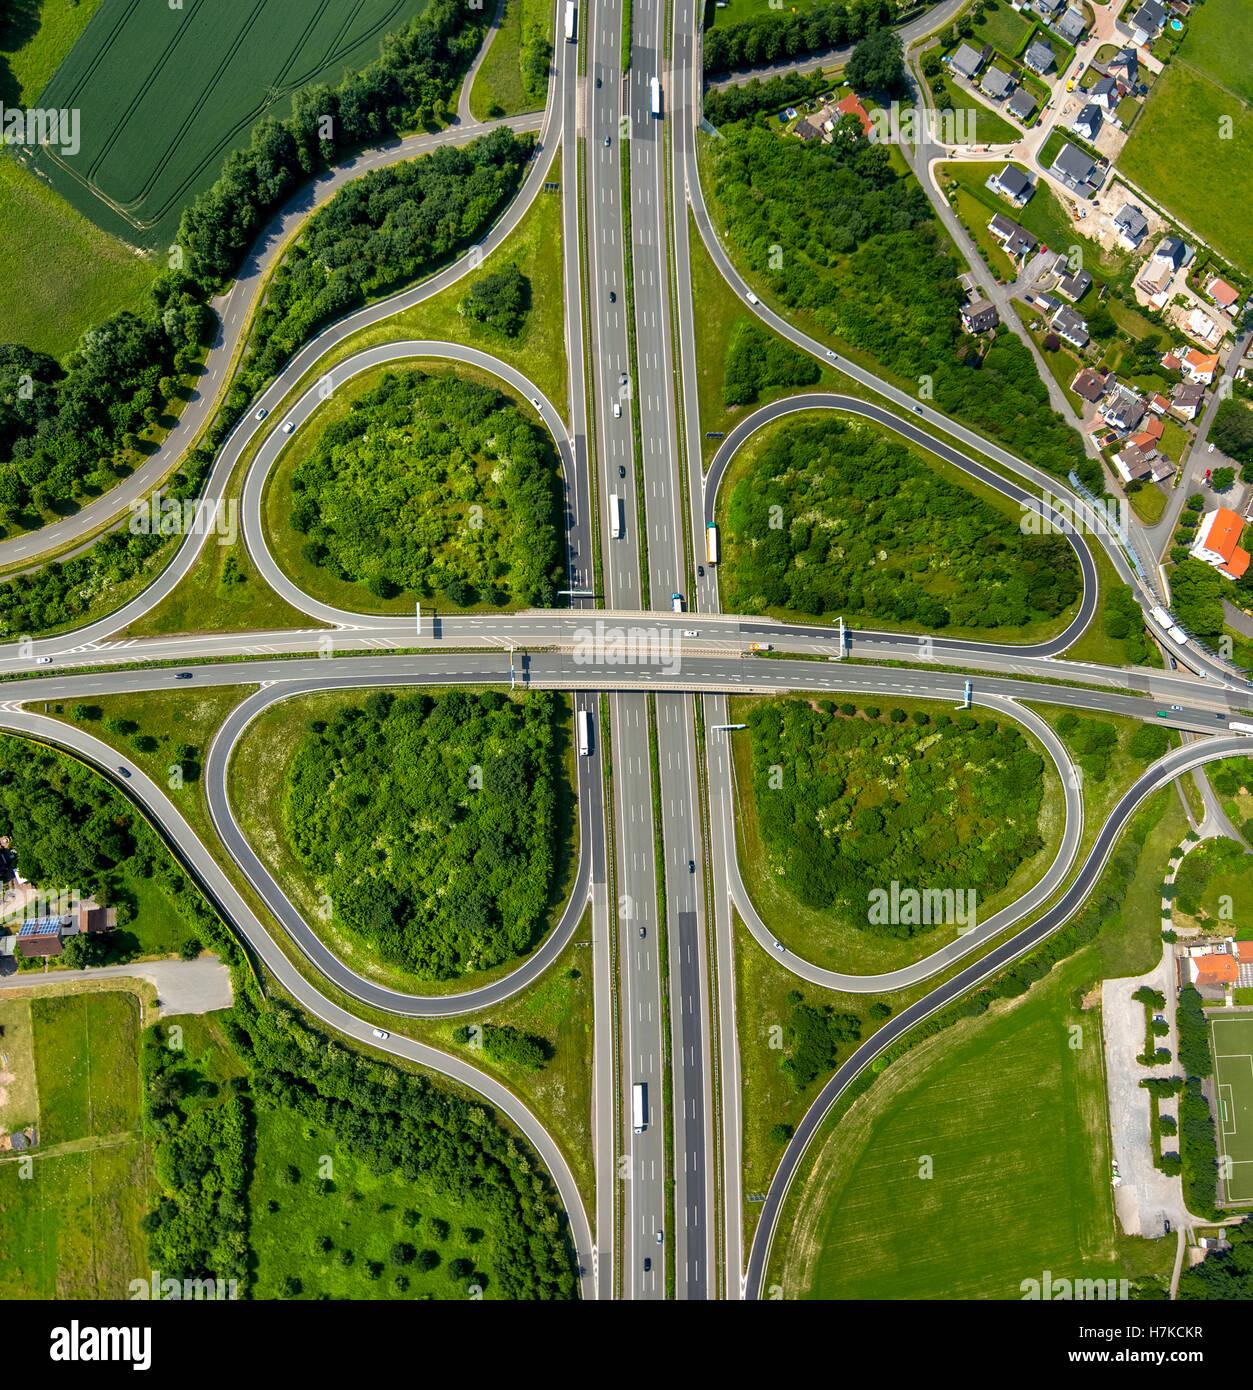 Cloverleaf intersection